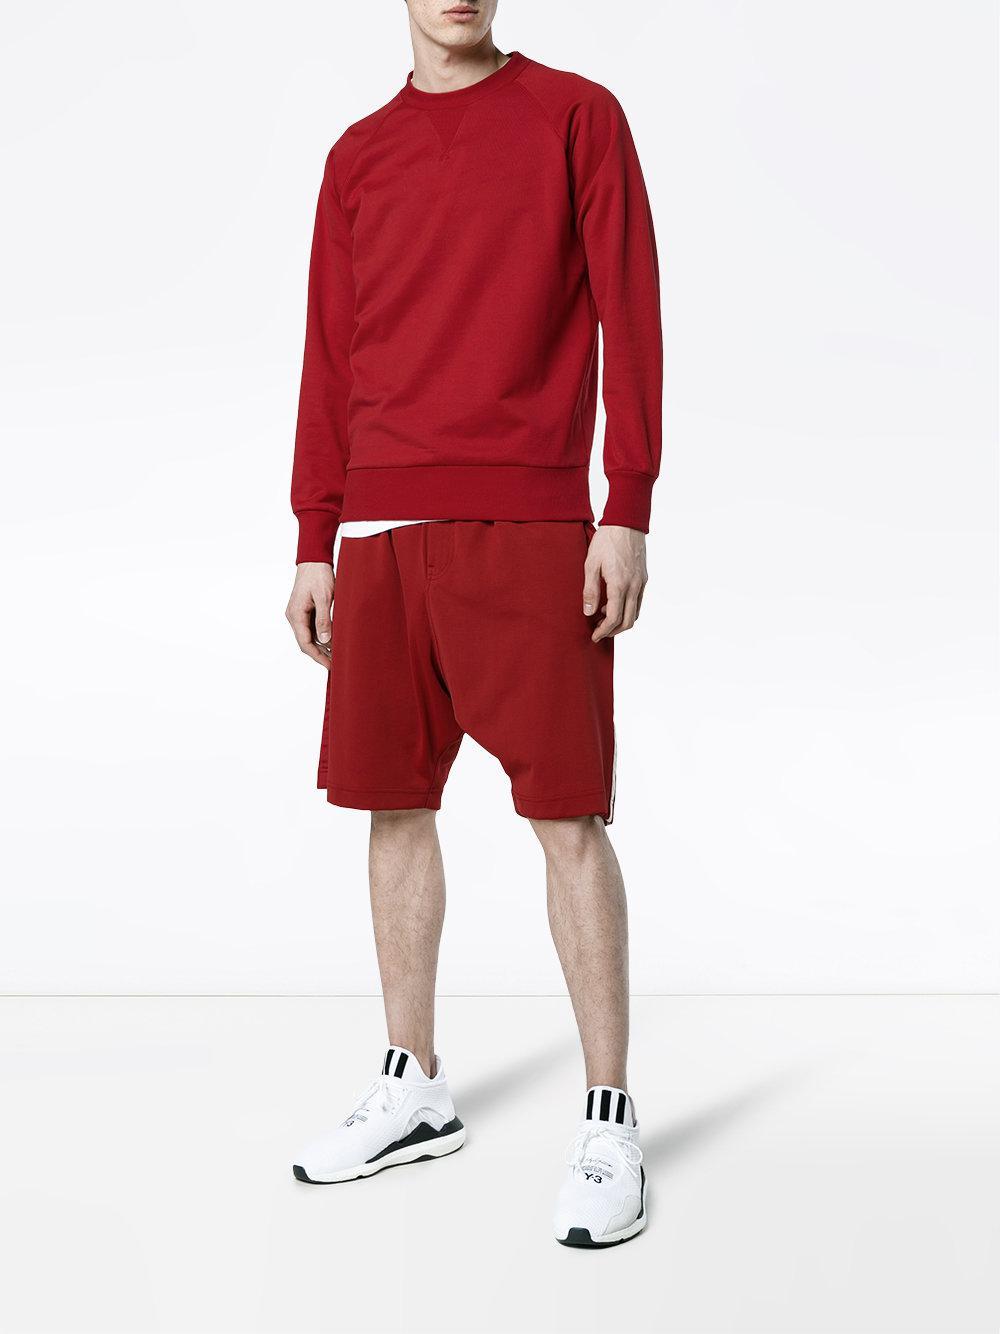 Y-3 Cotton Branded Sweatshirt in Red for Men